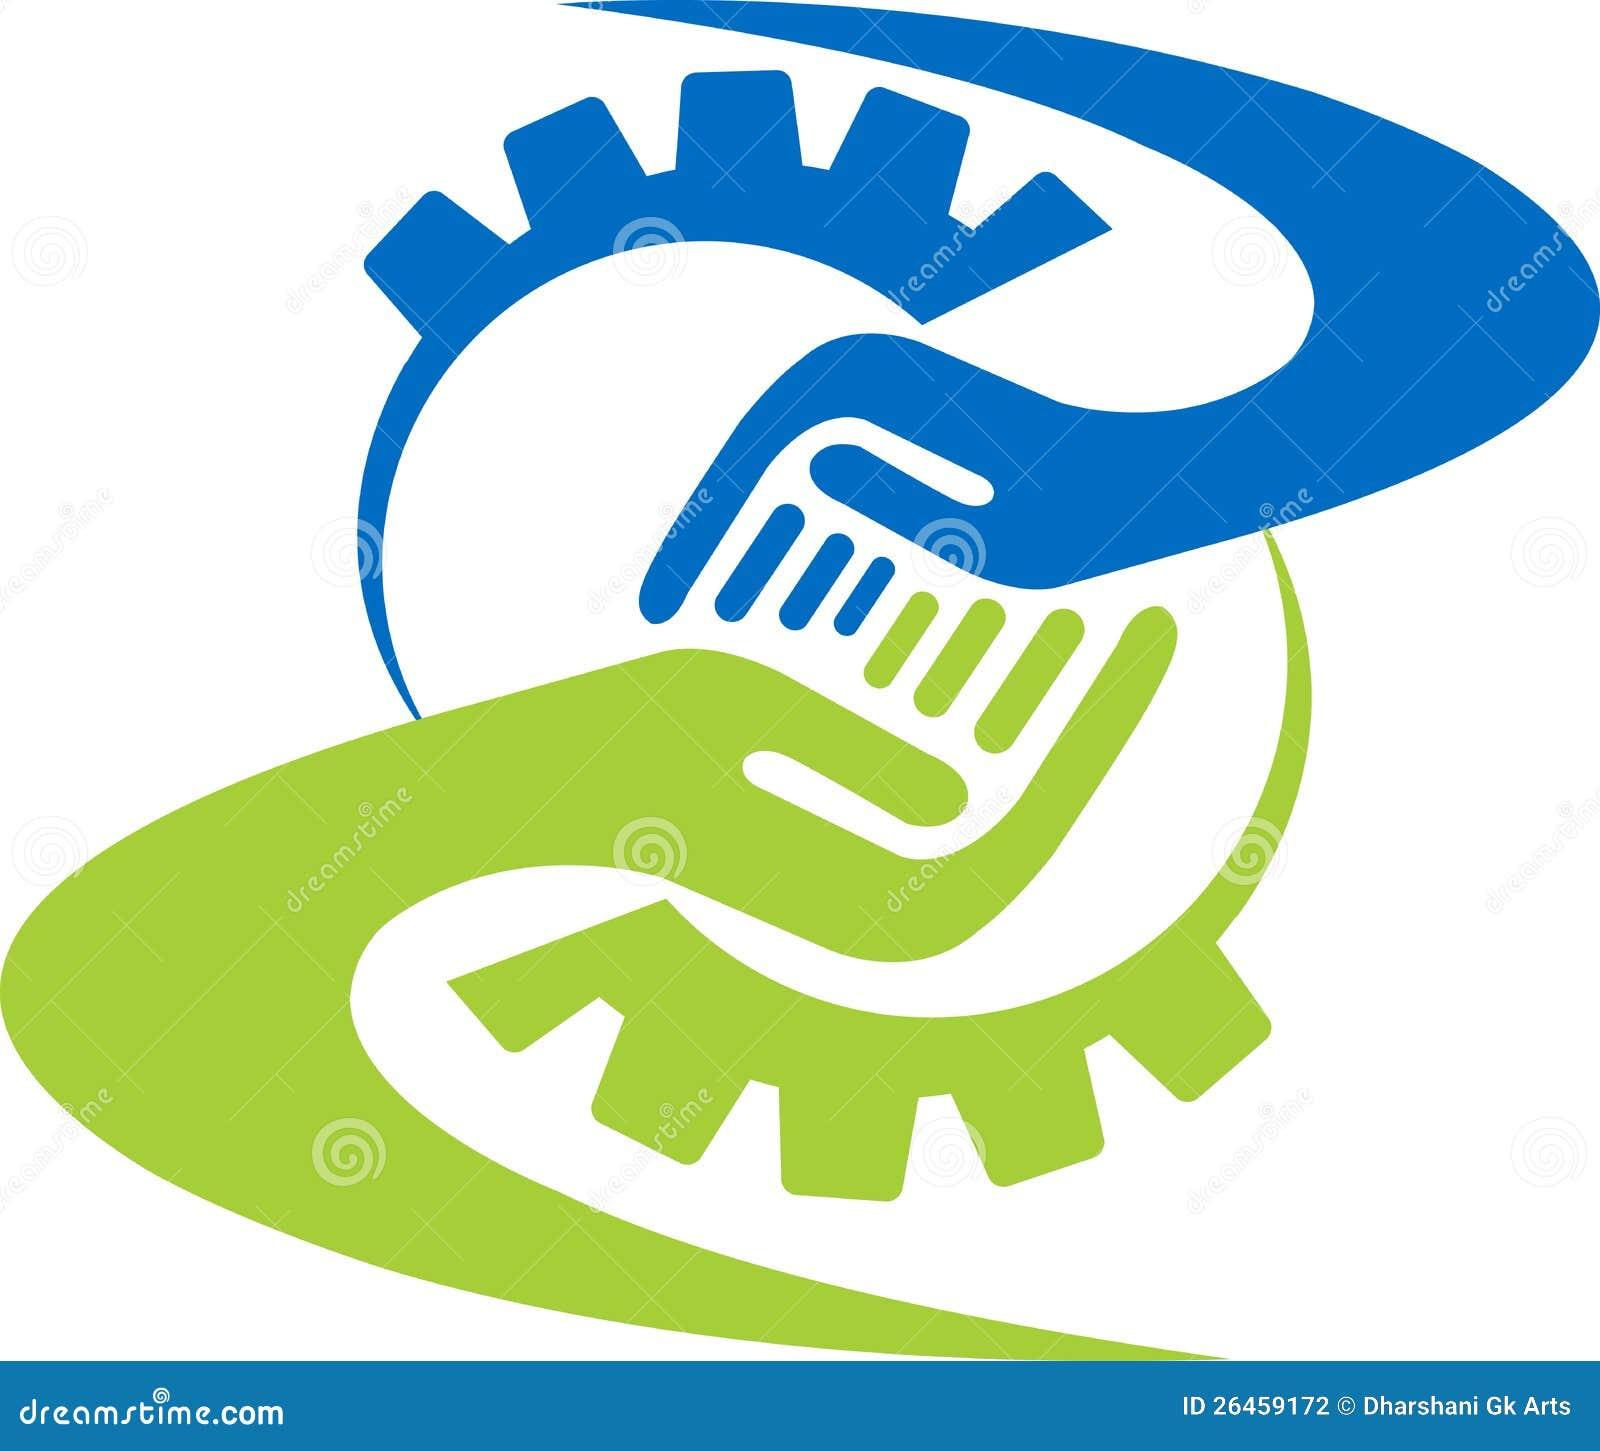 Factory friend logo